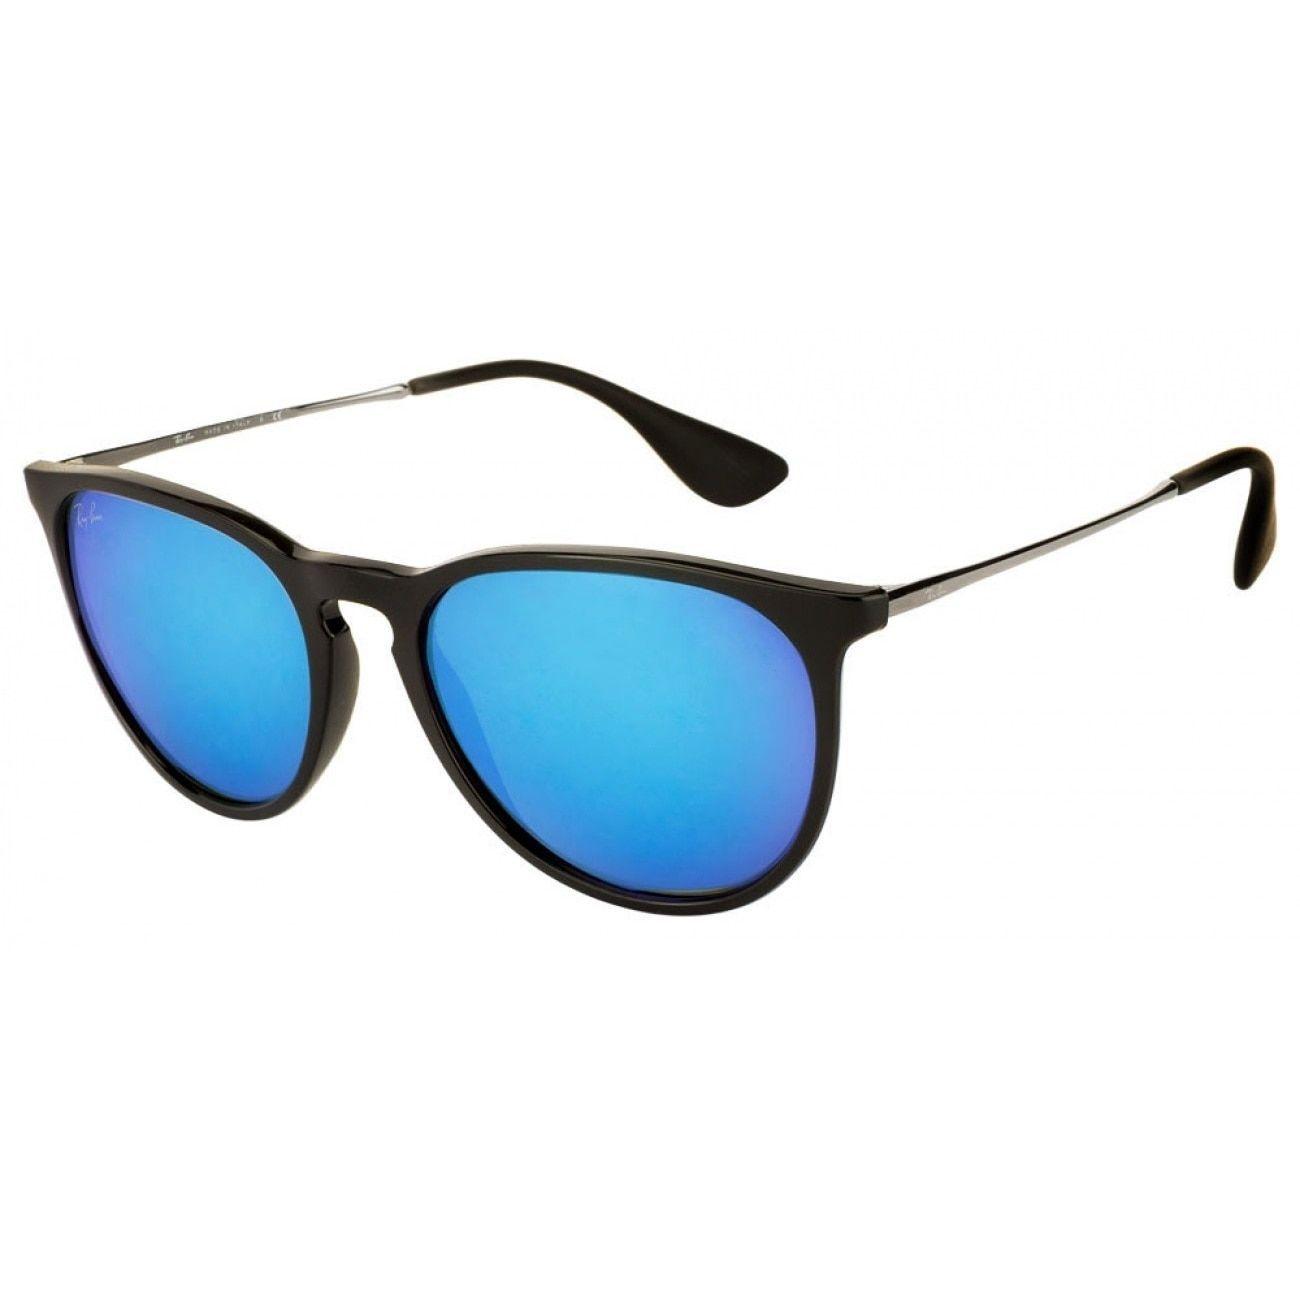 6fcf46a83e293 Ray-Ban Erika RB4171 601 55 Women s  Silver Frame Blue Mirror 54mm Lens  Sunglasses